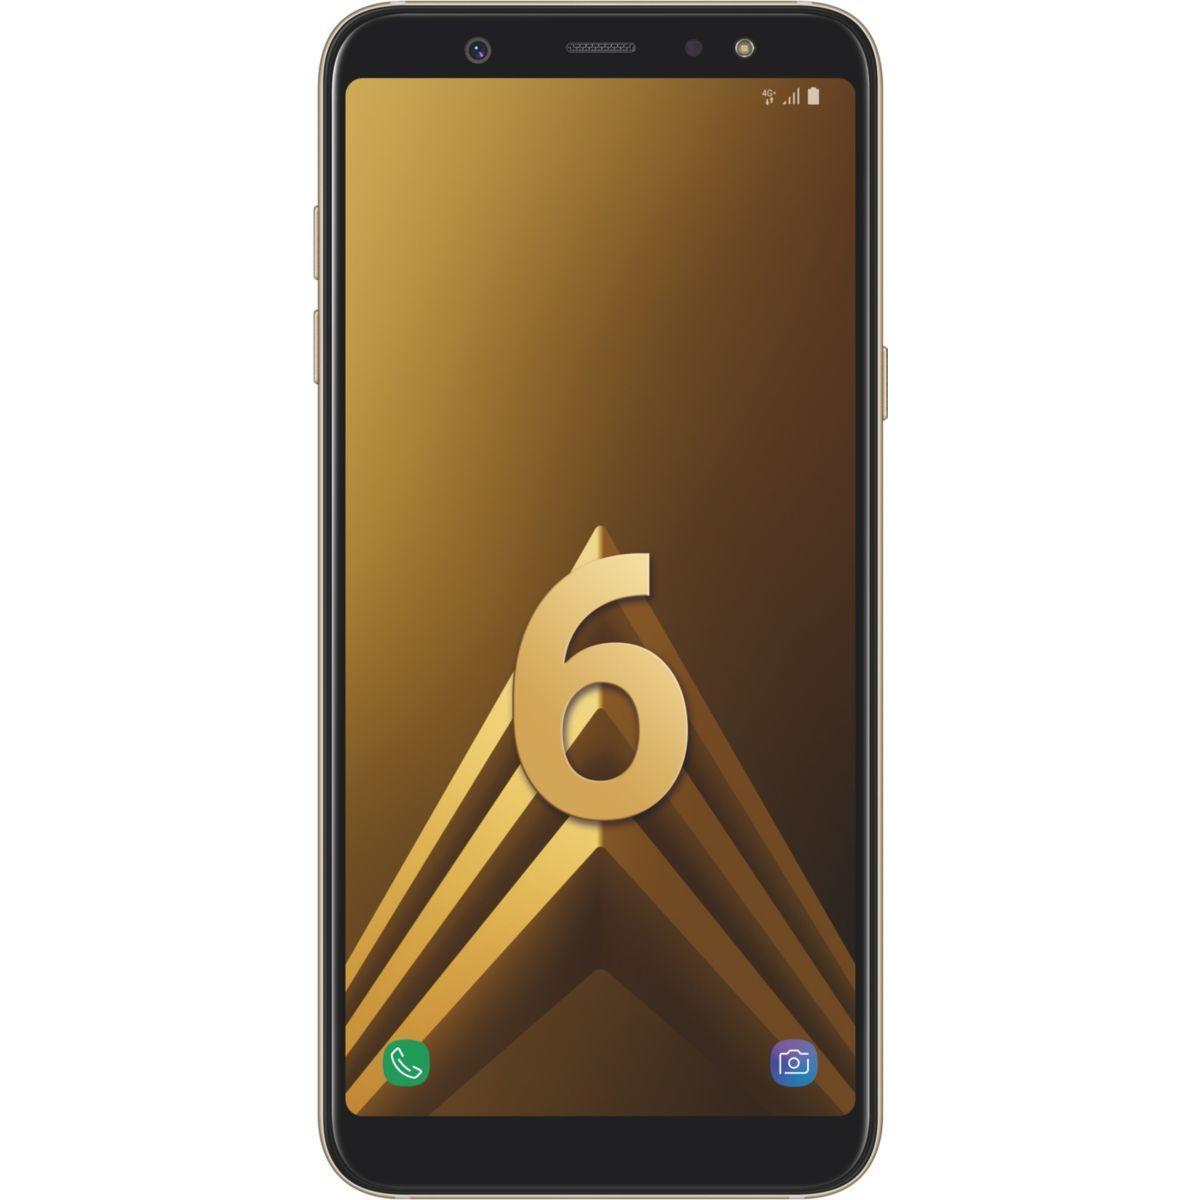 Smartphone samsung galaxy a6+ gold